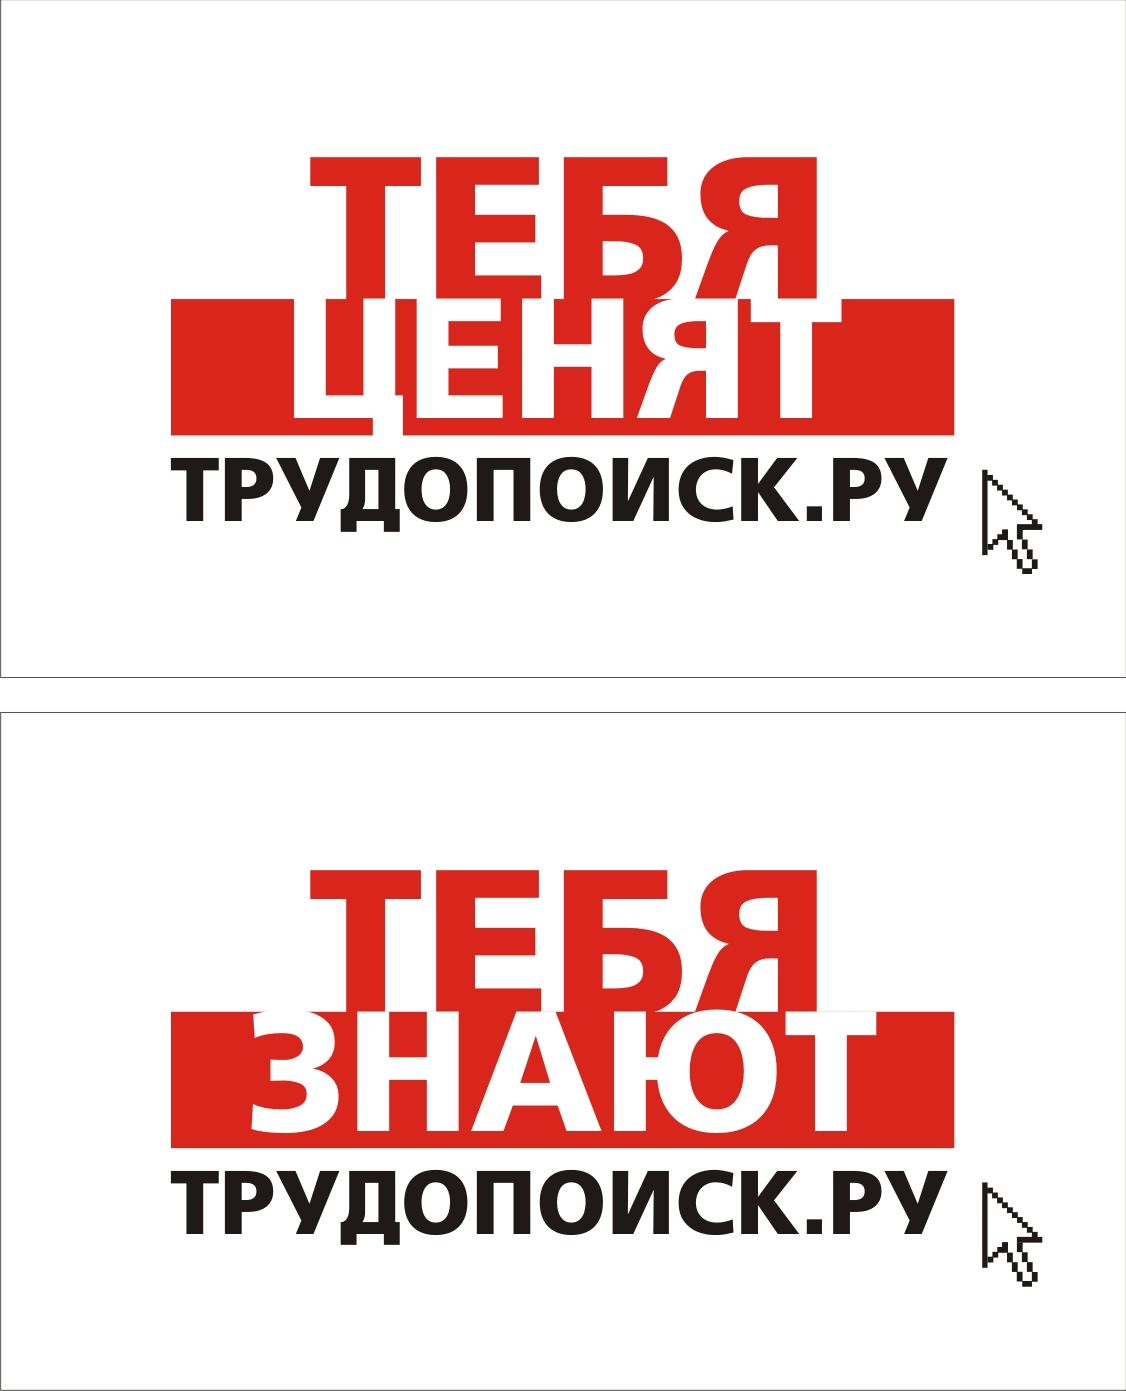 Креатив для постера Трудопоиск.ру  - дизайнер Kairat_D